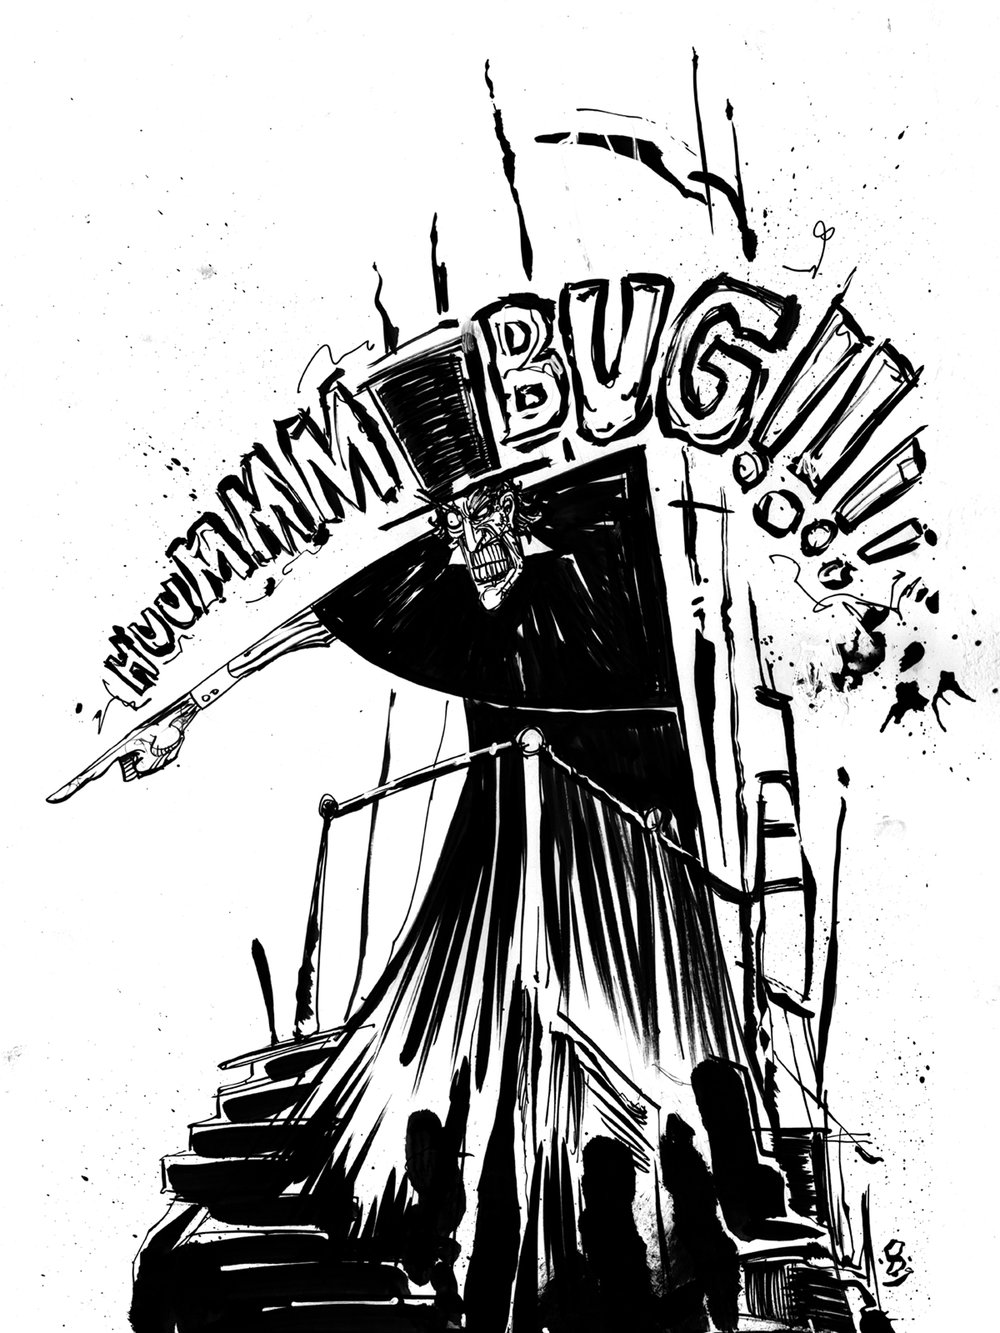 Humbug!FinalSM.jpg